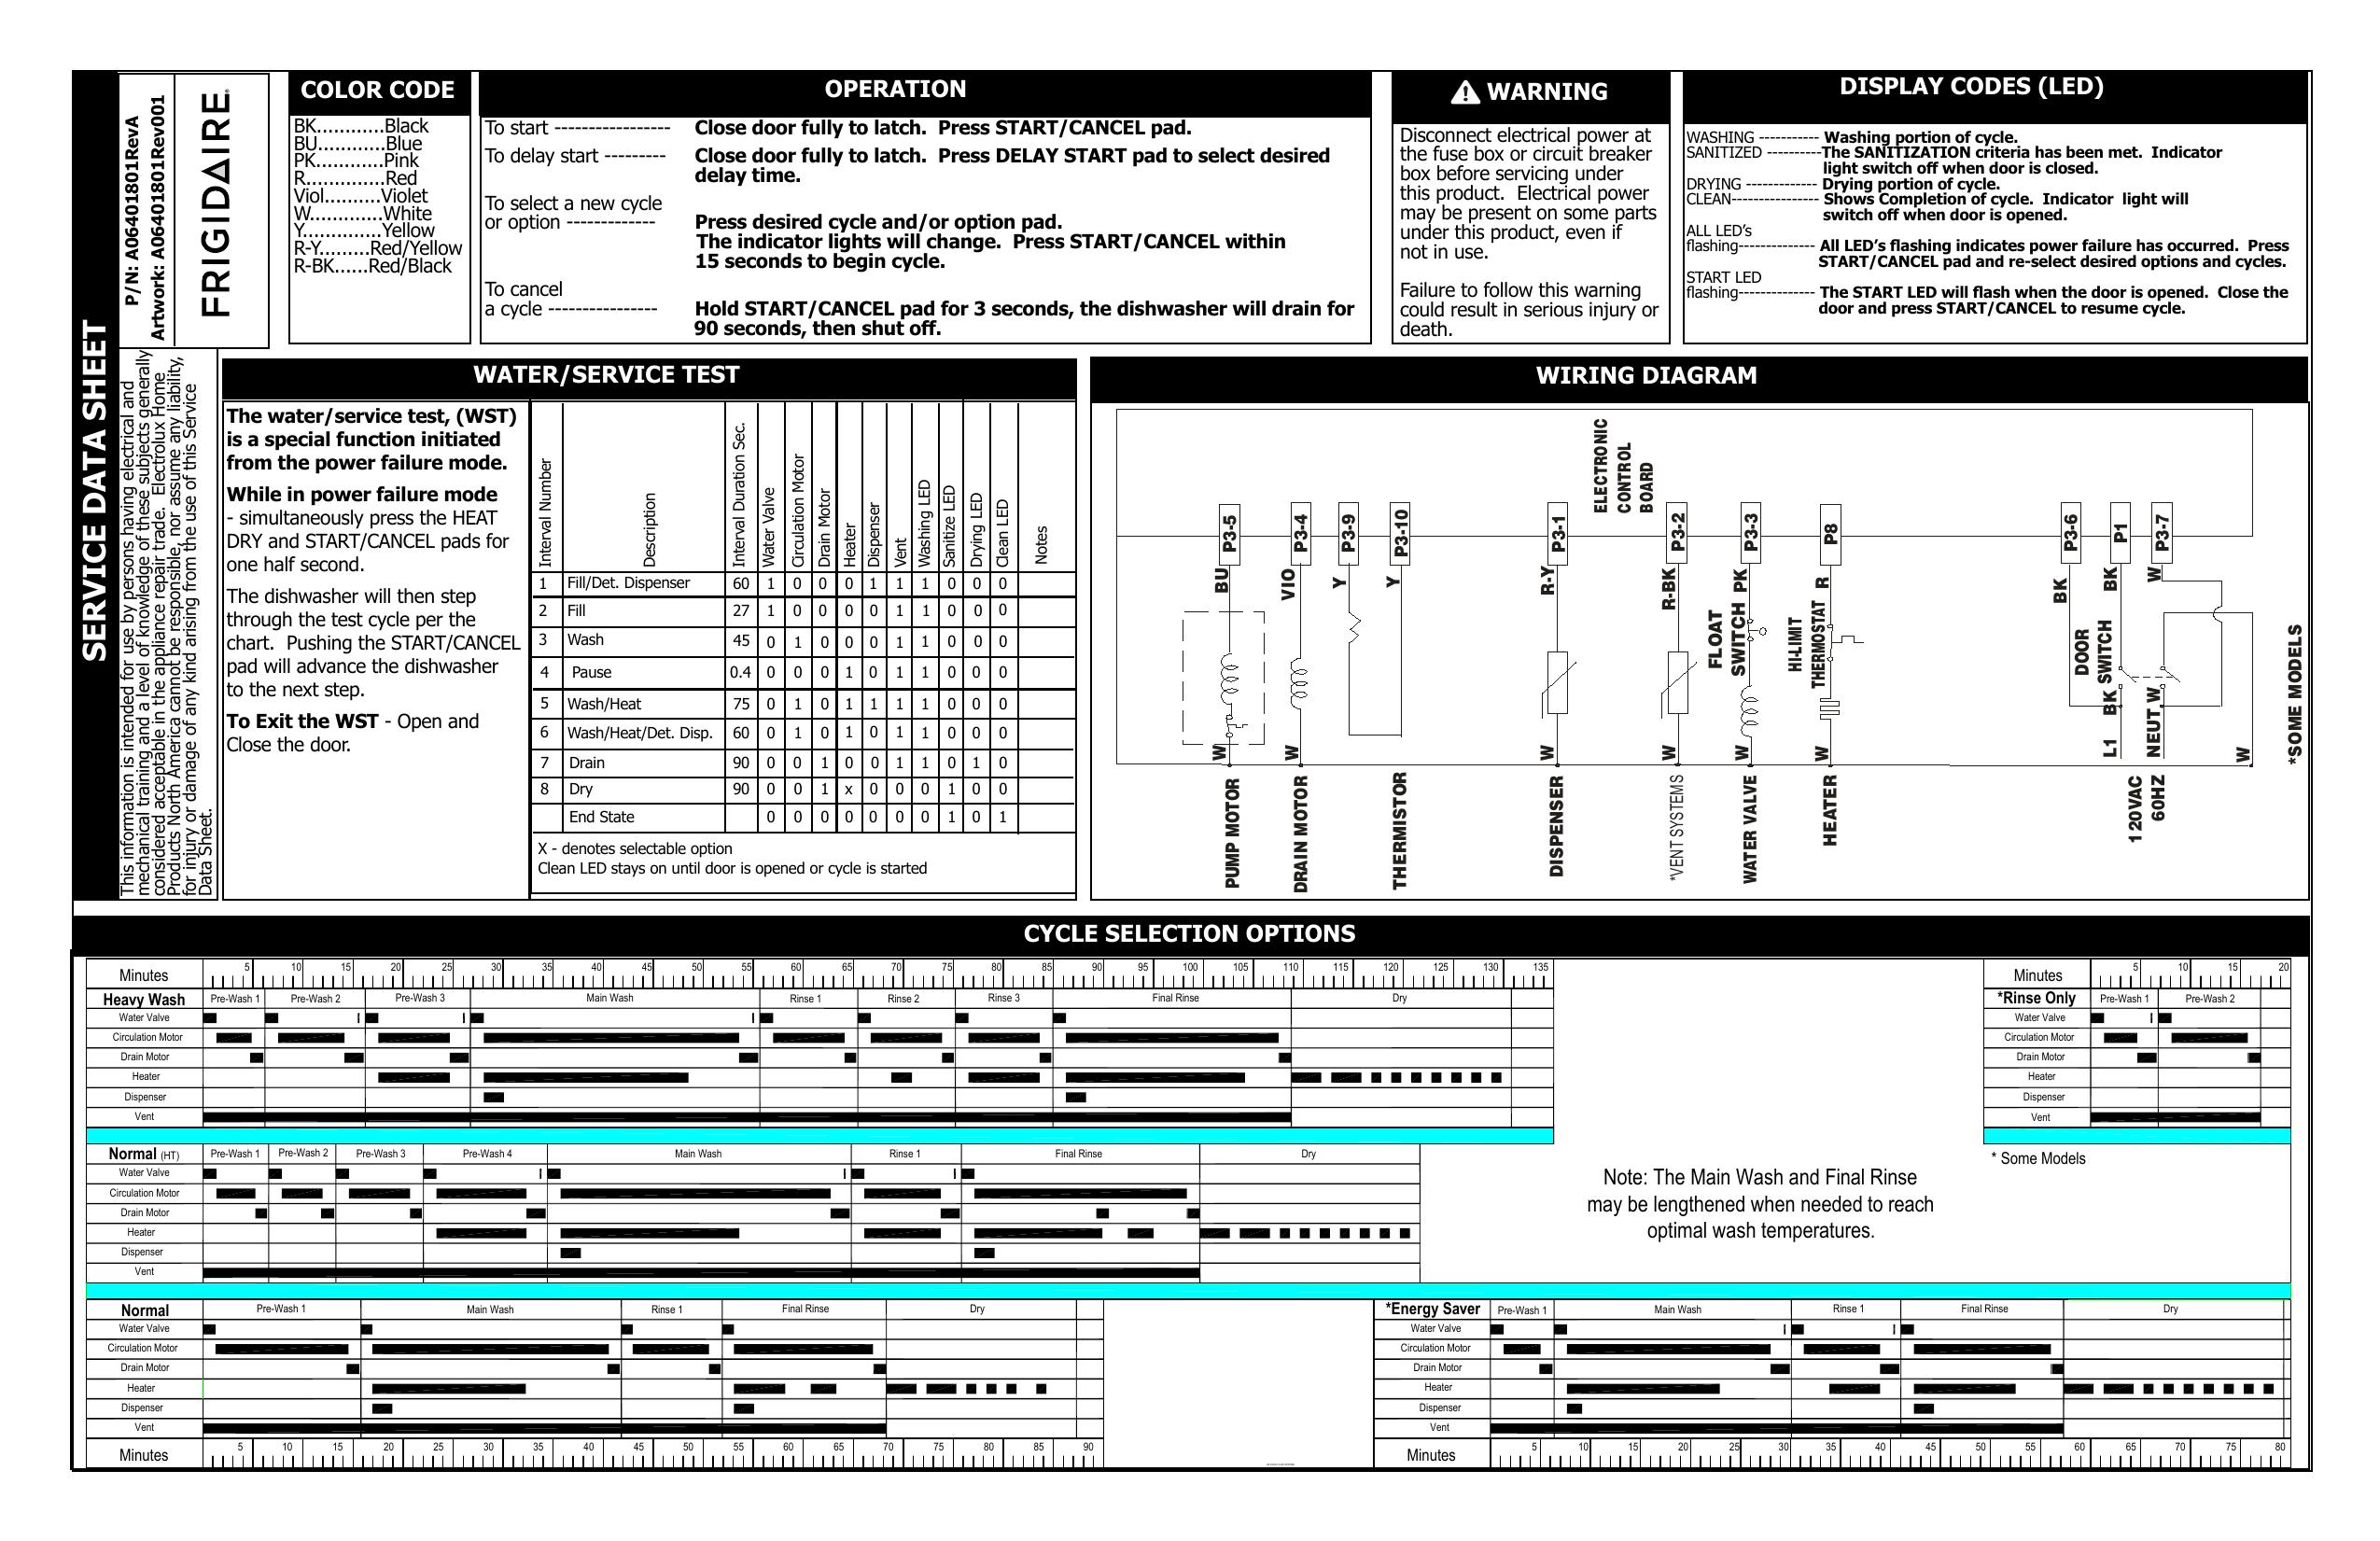 frigidaire valve wiring diagram frigidaire ffbd2412ss wiring diagram manualzz  frigidaire ffbd2412ss wiring diagram